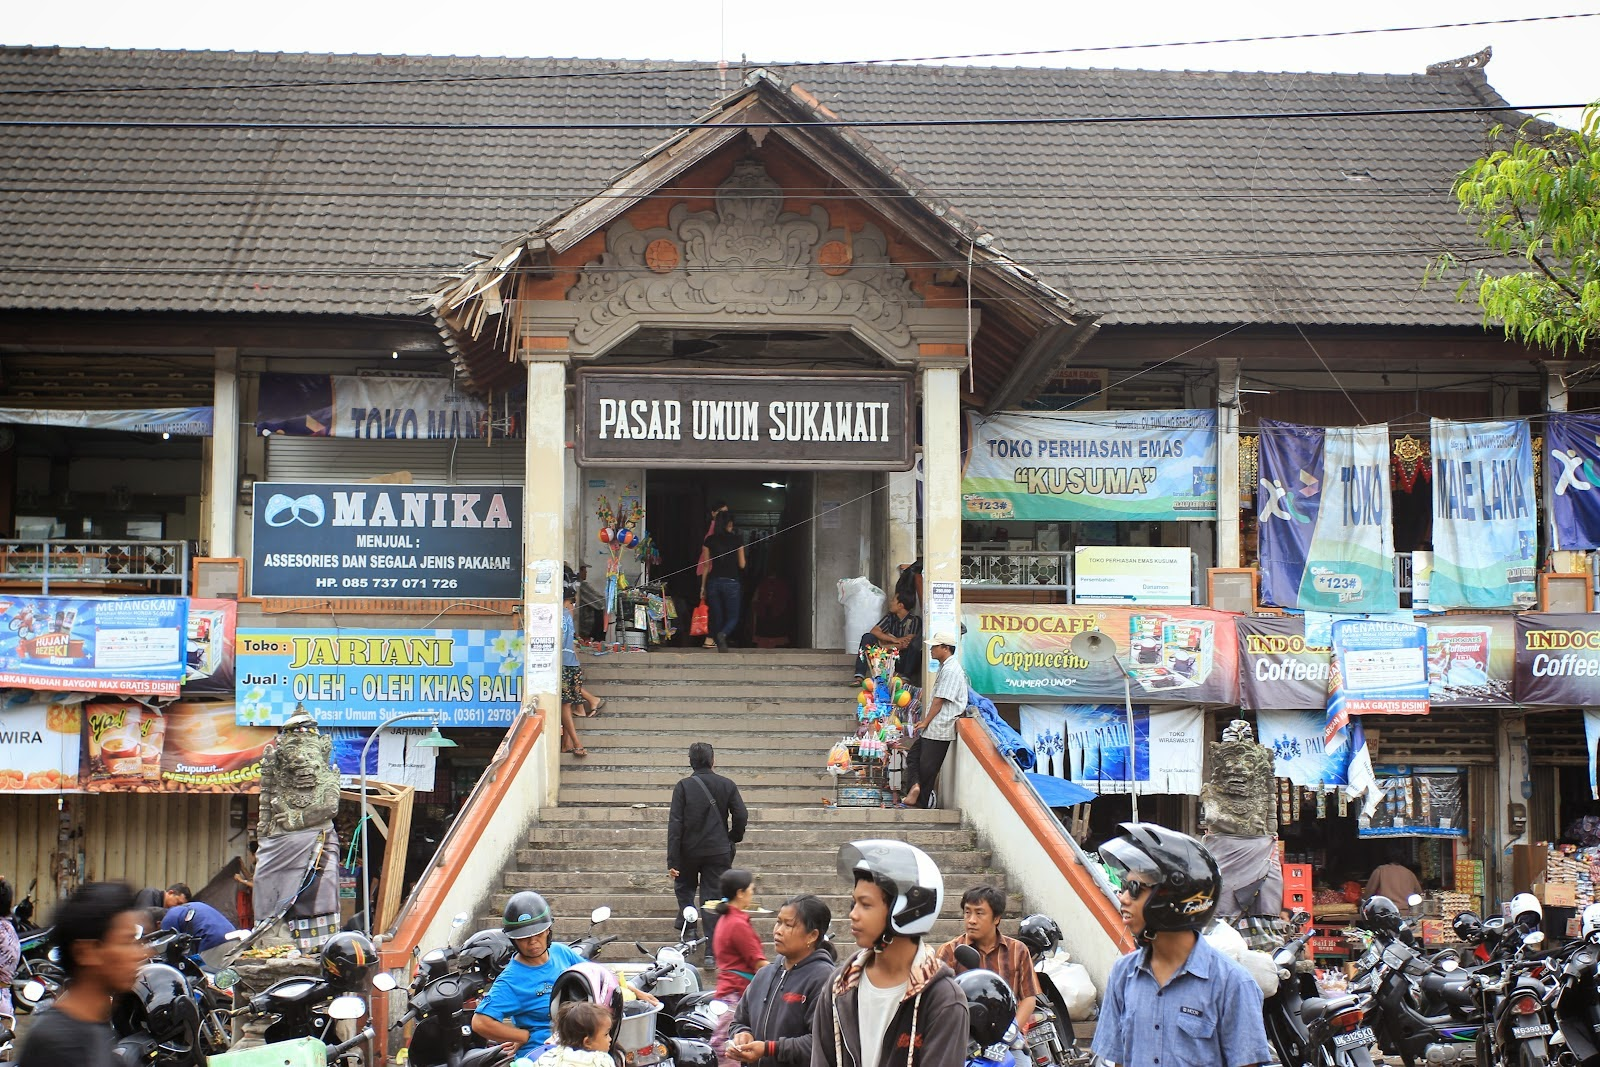 Pasar Seni Sukawati Sumber Suvenir Khas Bali Pariwisata Kab Gianyar